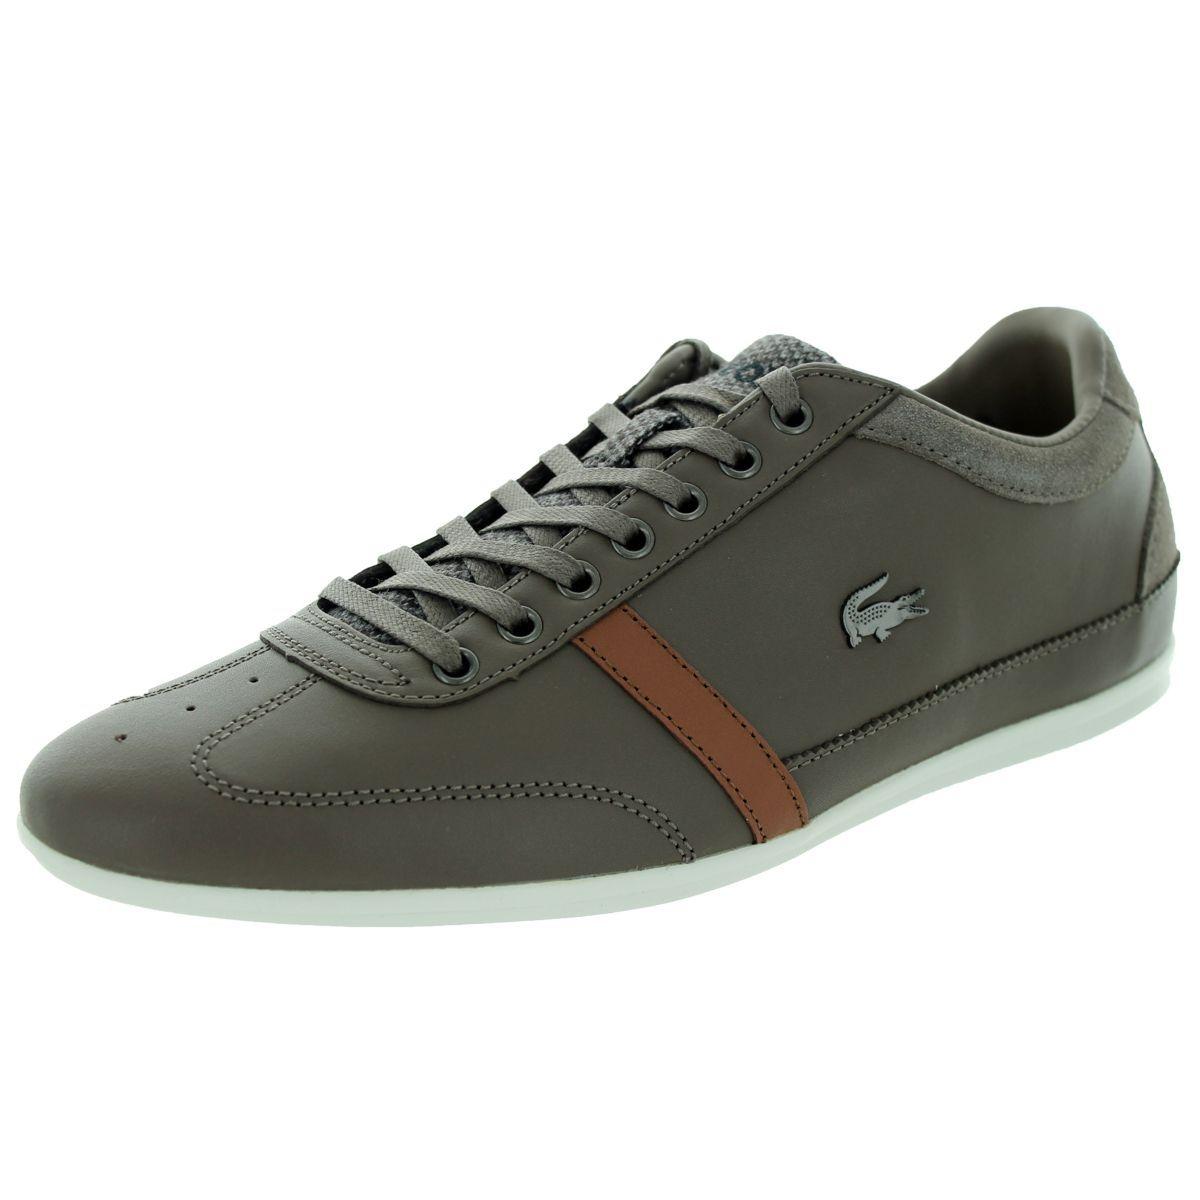 6a9227f6ca2f35 Lacoste Men s Misano 32 Srm Khaki Casual Shoe